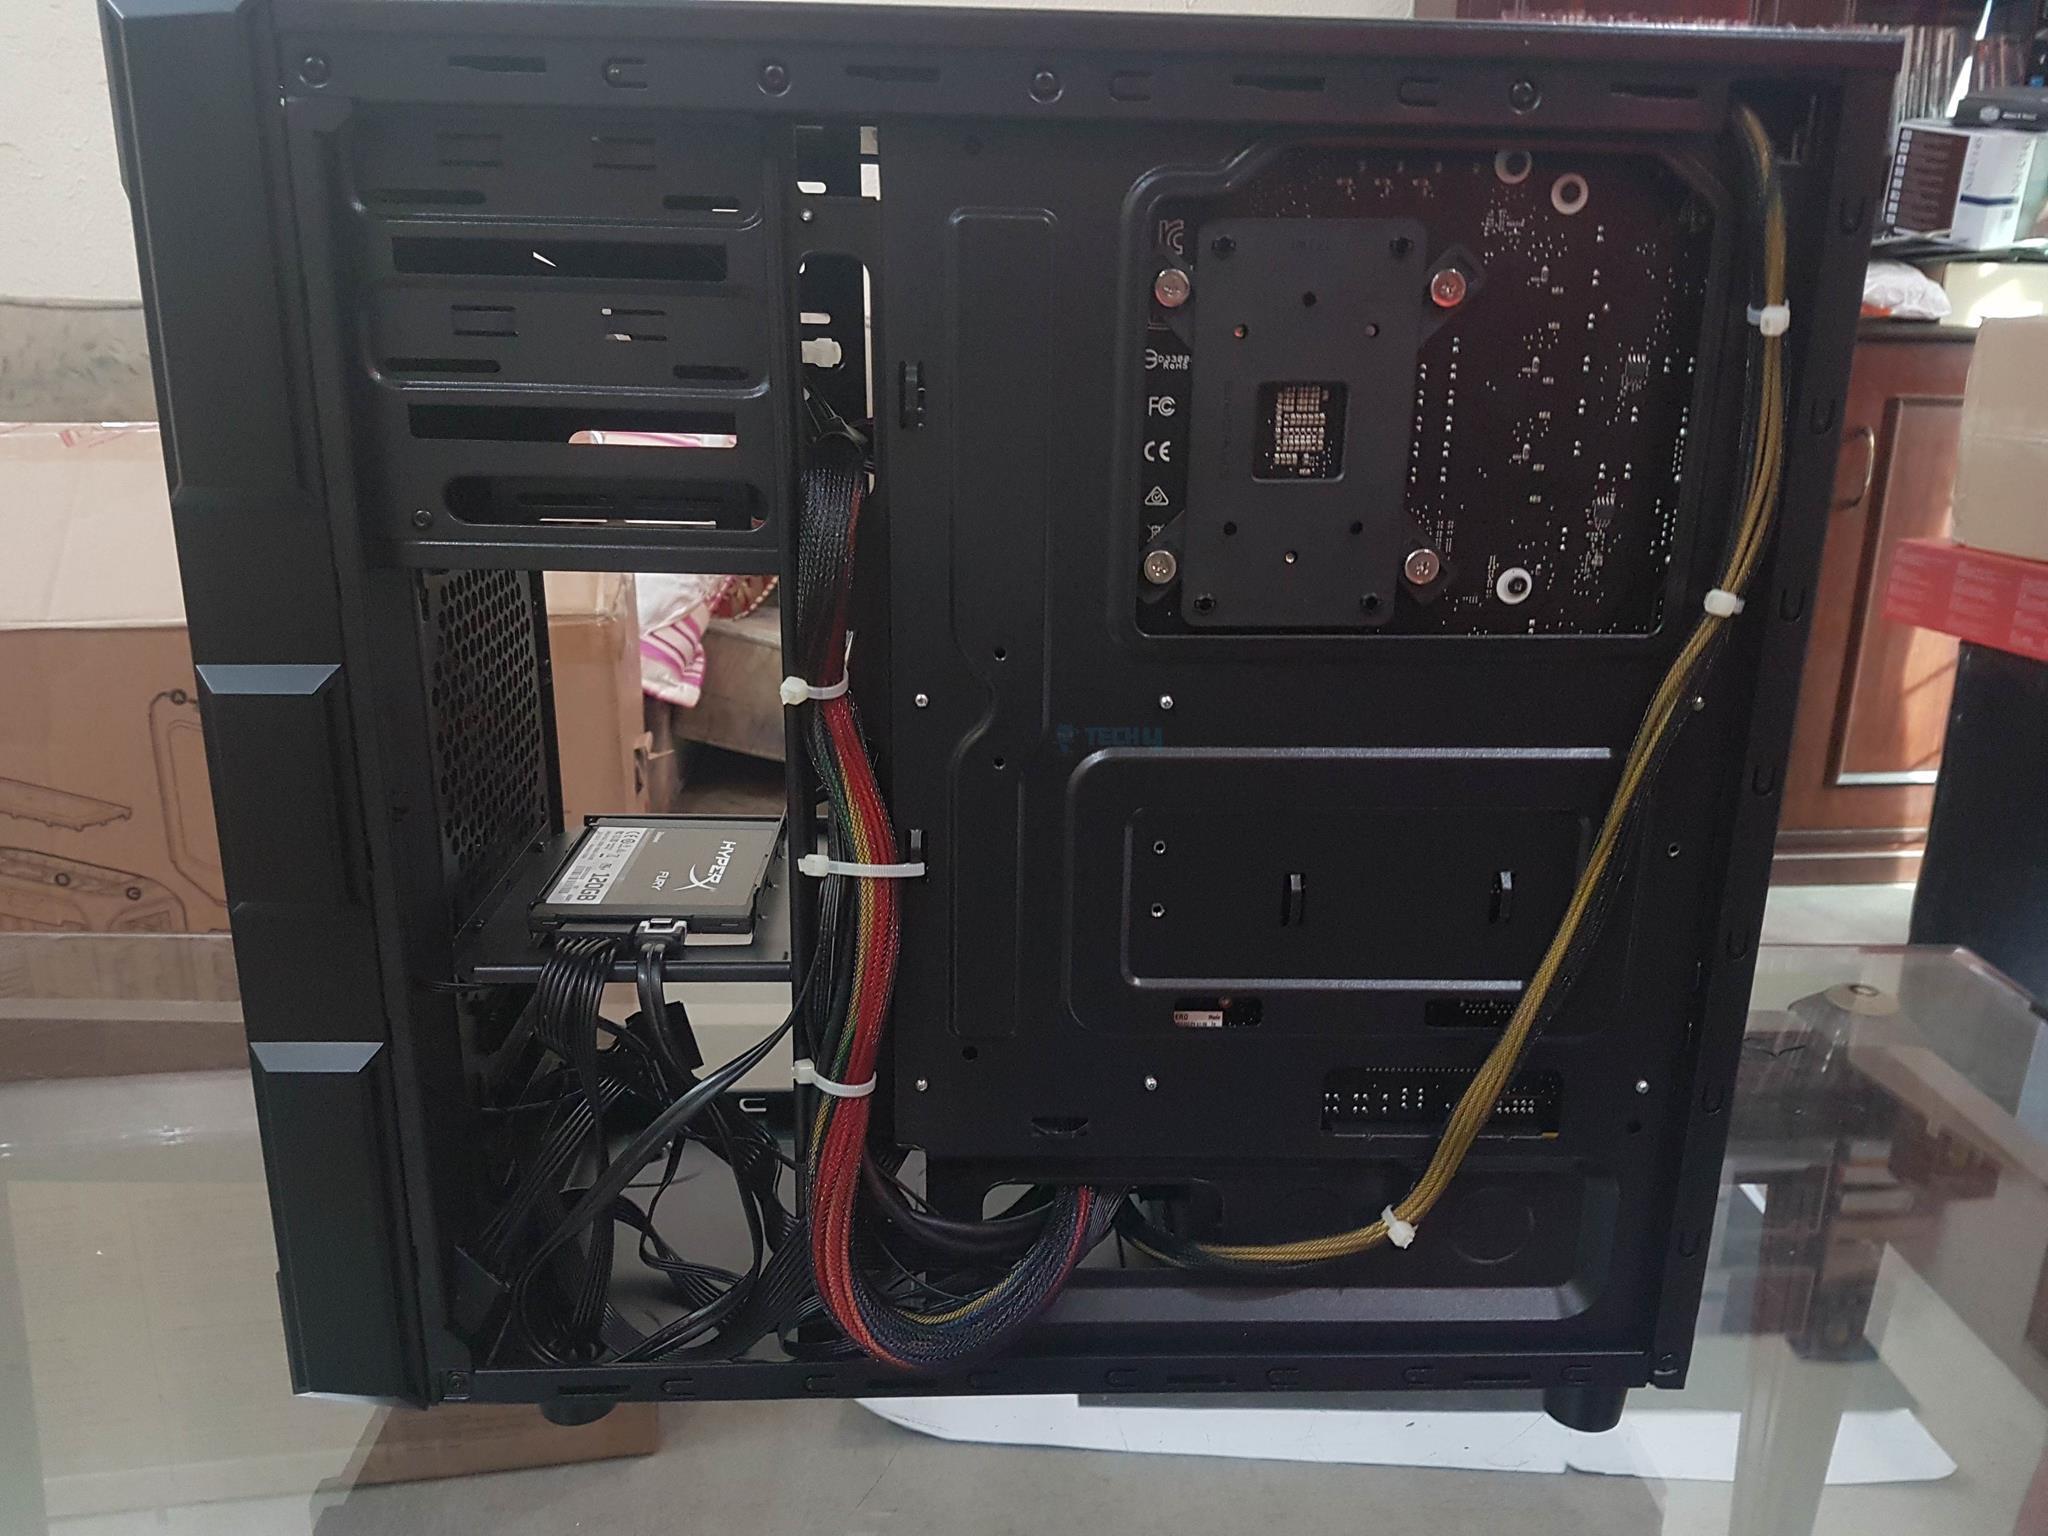 antec gx200 window blue review controller wiring diagram antec case wiring diagram #8